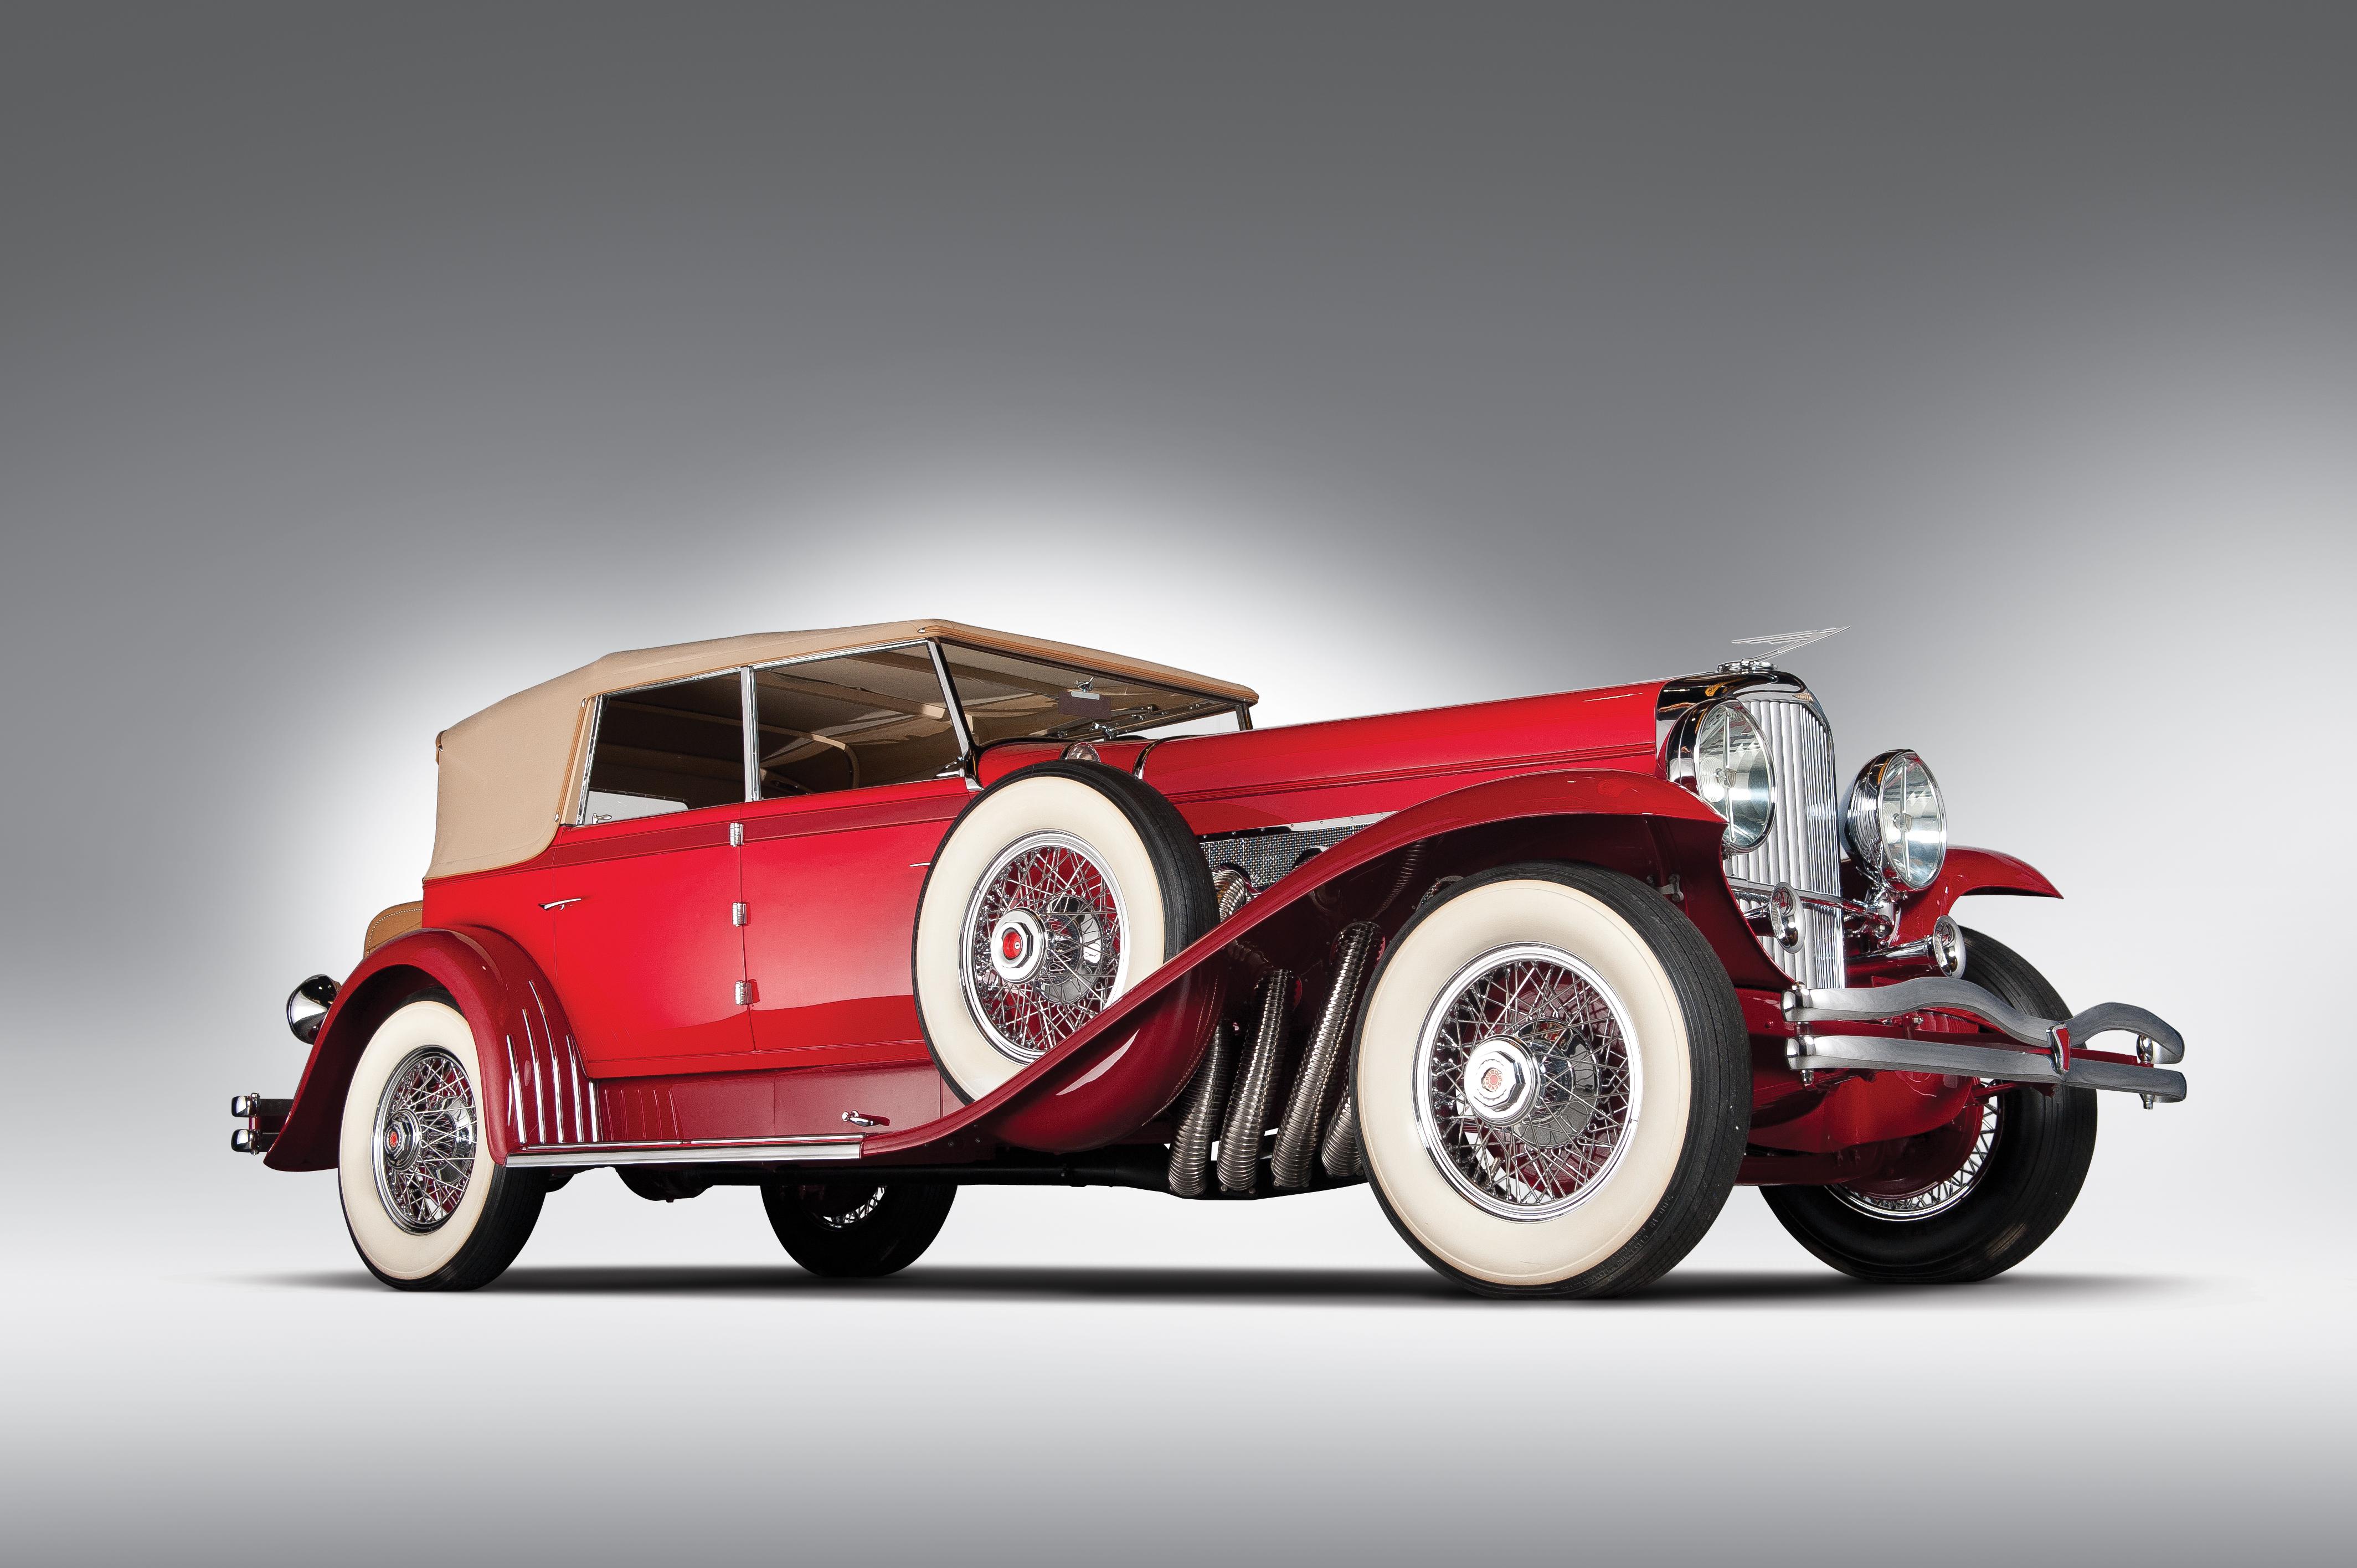 vintage car wallpaper 4256x2832 70526 wallpaperup